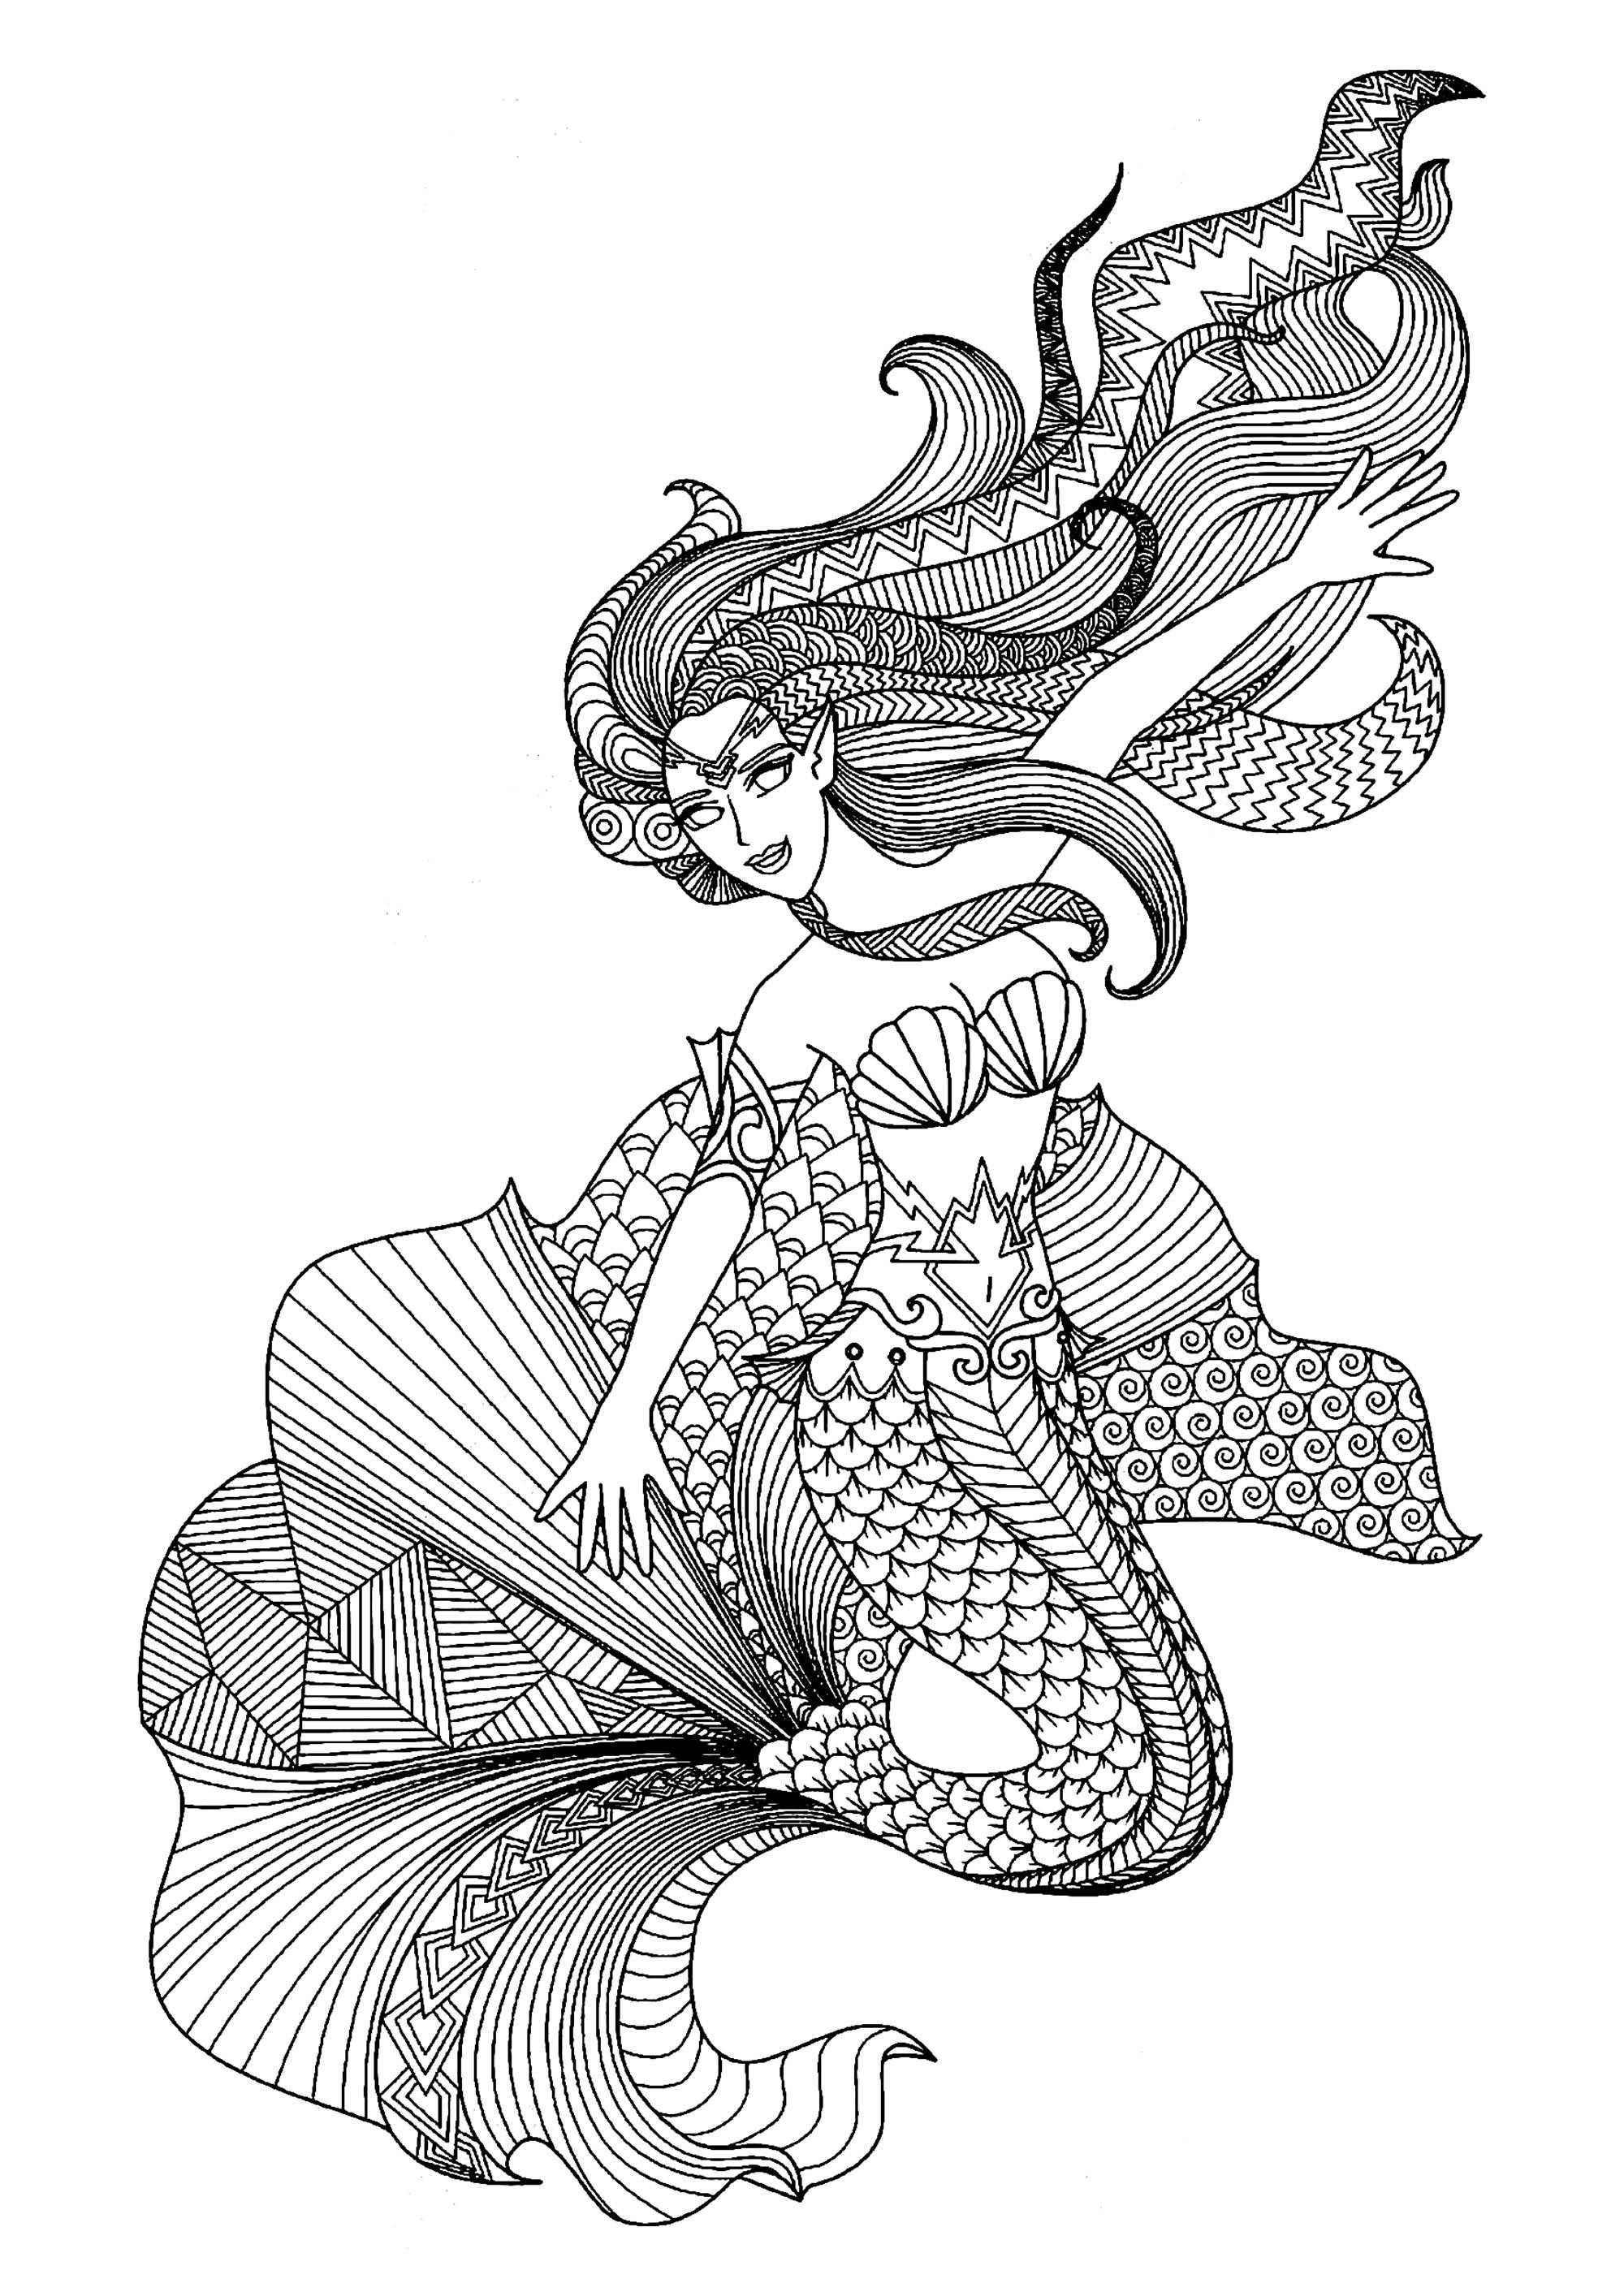 Meerjungfrauen Malbuch Fur Erwachsene